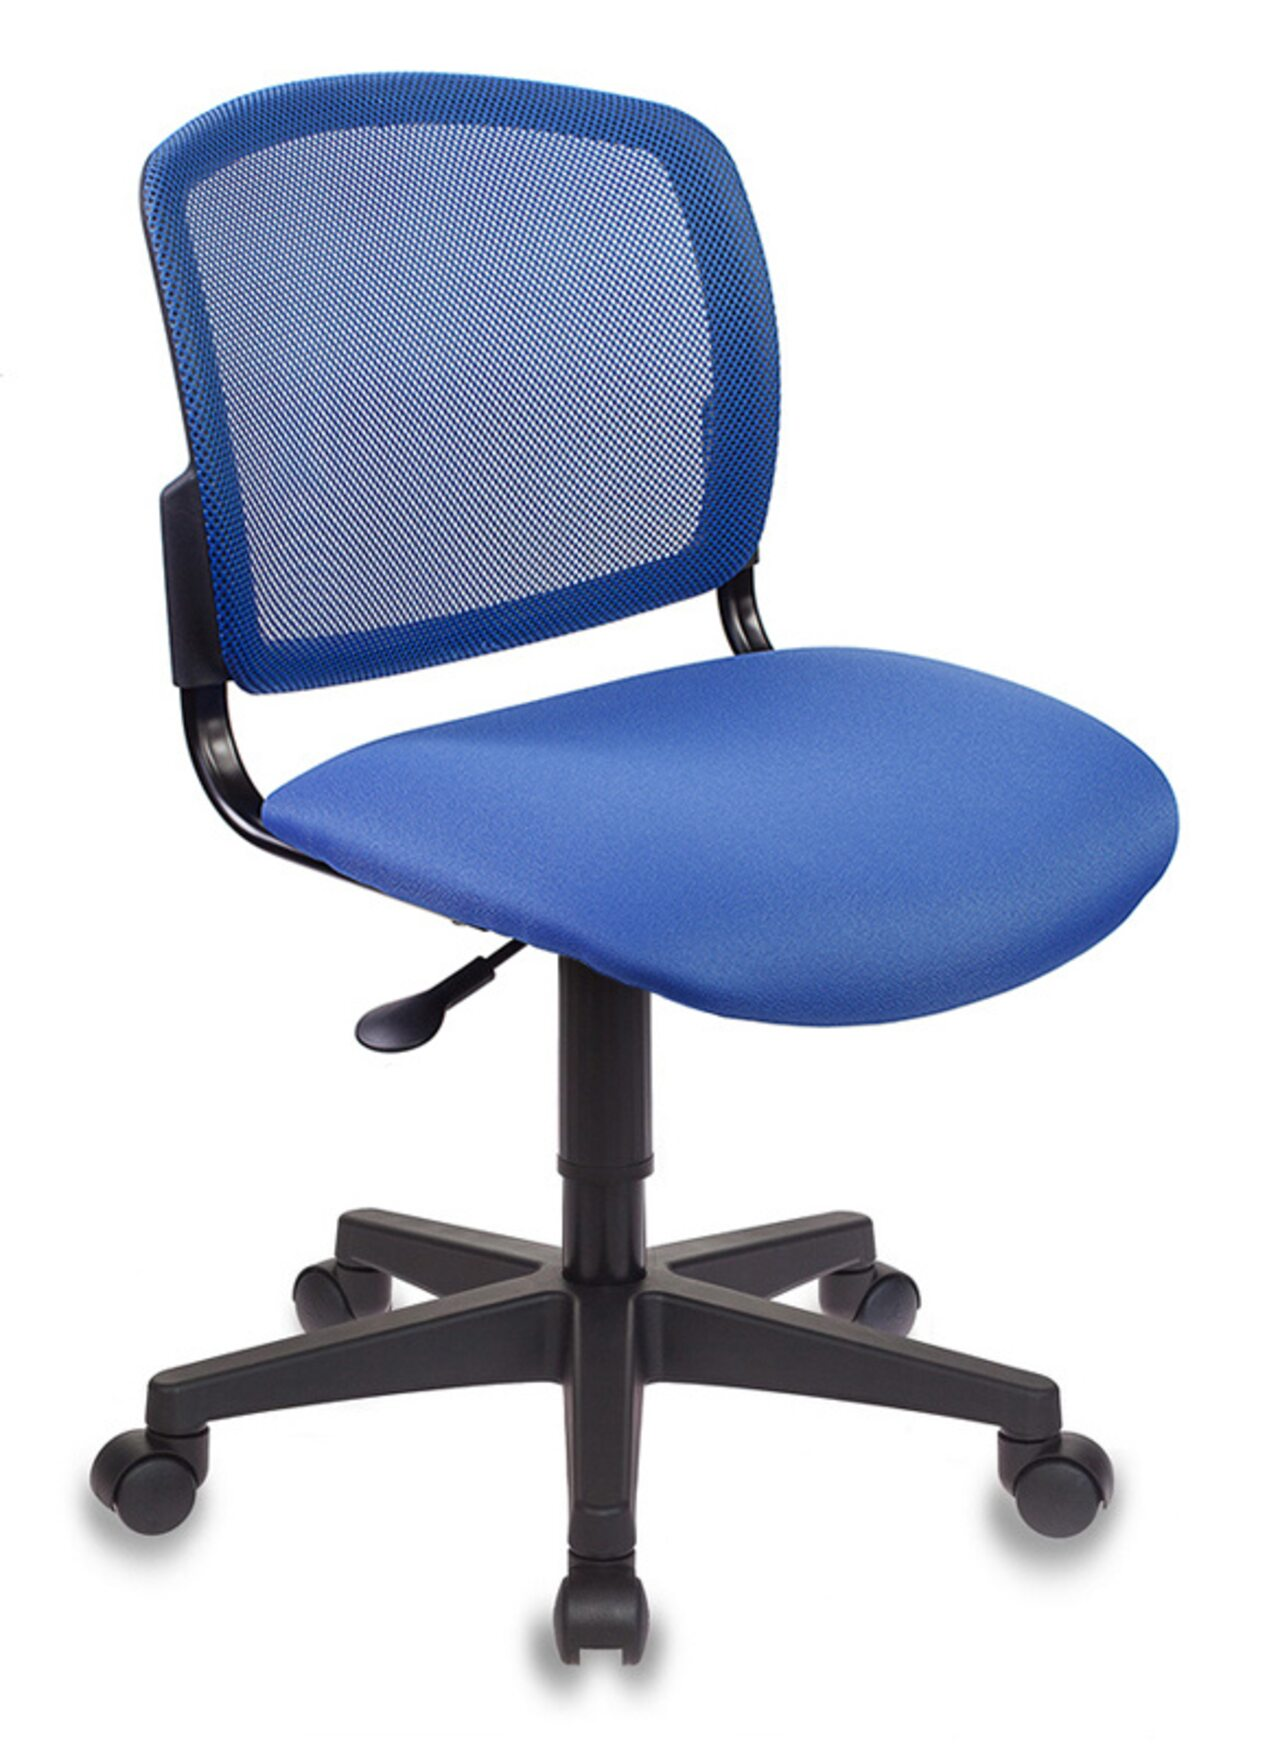 Кресло для персонала CH-296/BL/15-10 - фото 1